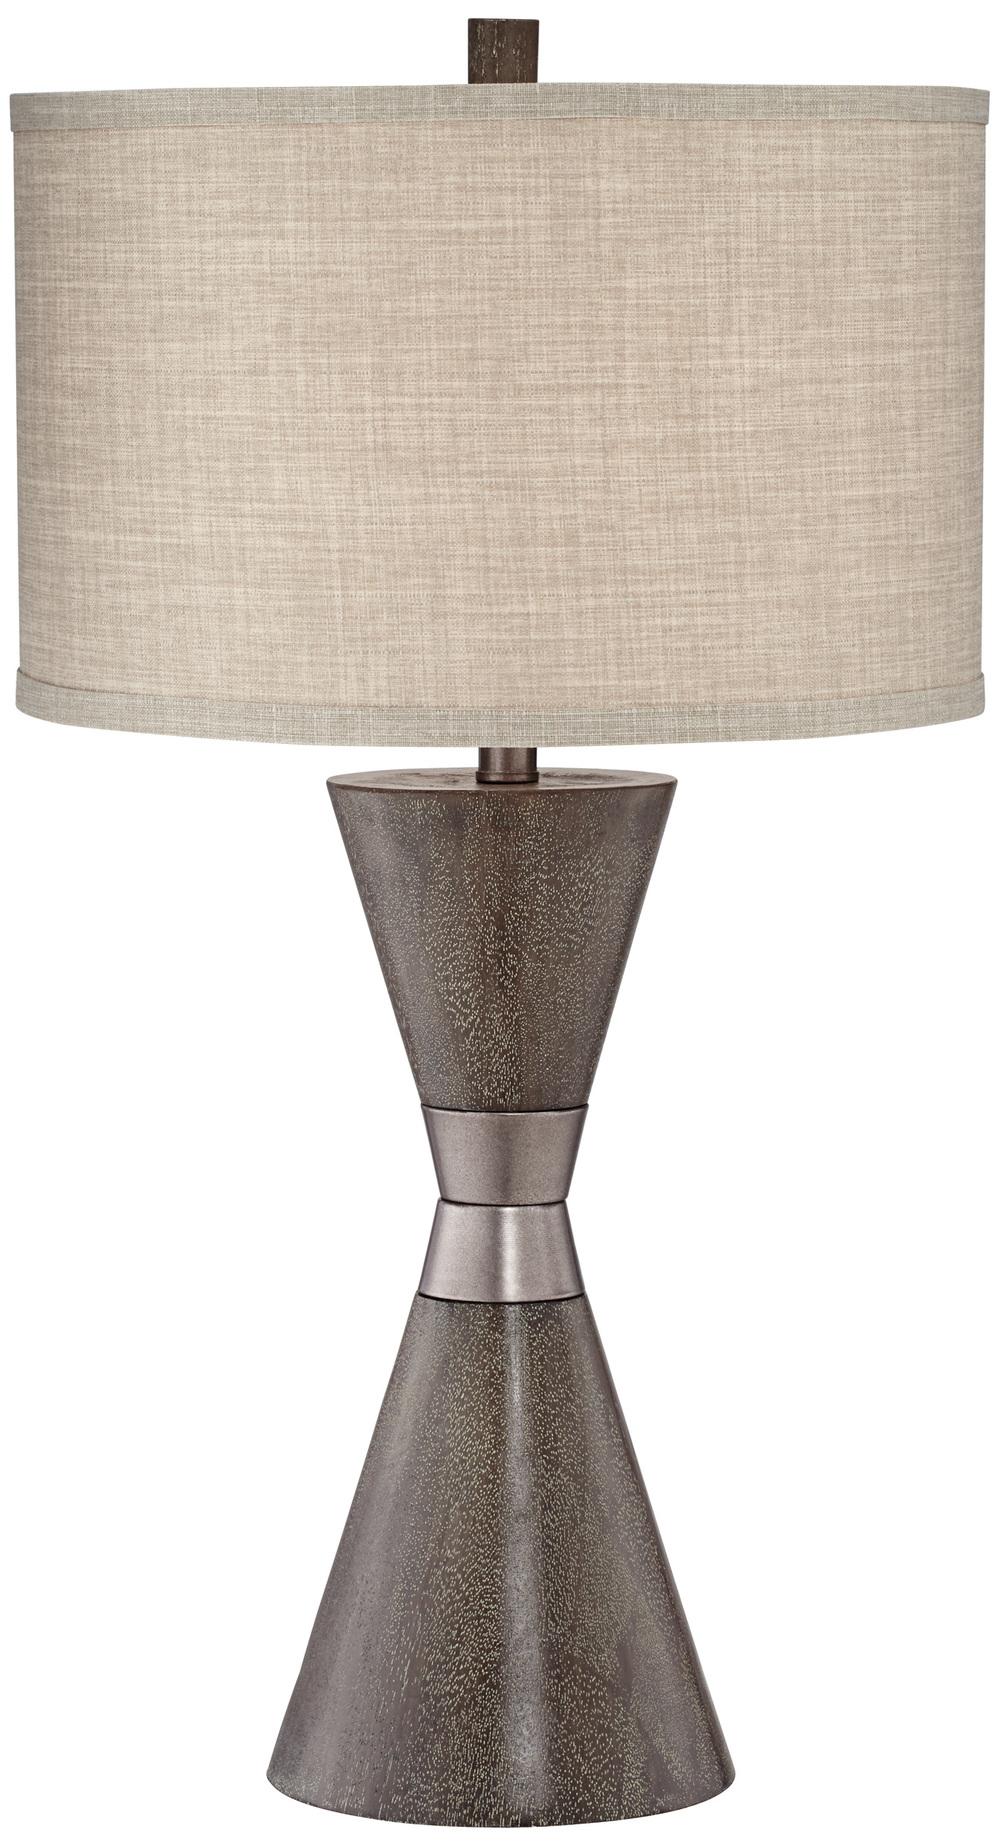 Pacific Coast Lighting - Kingstown Lamp